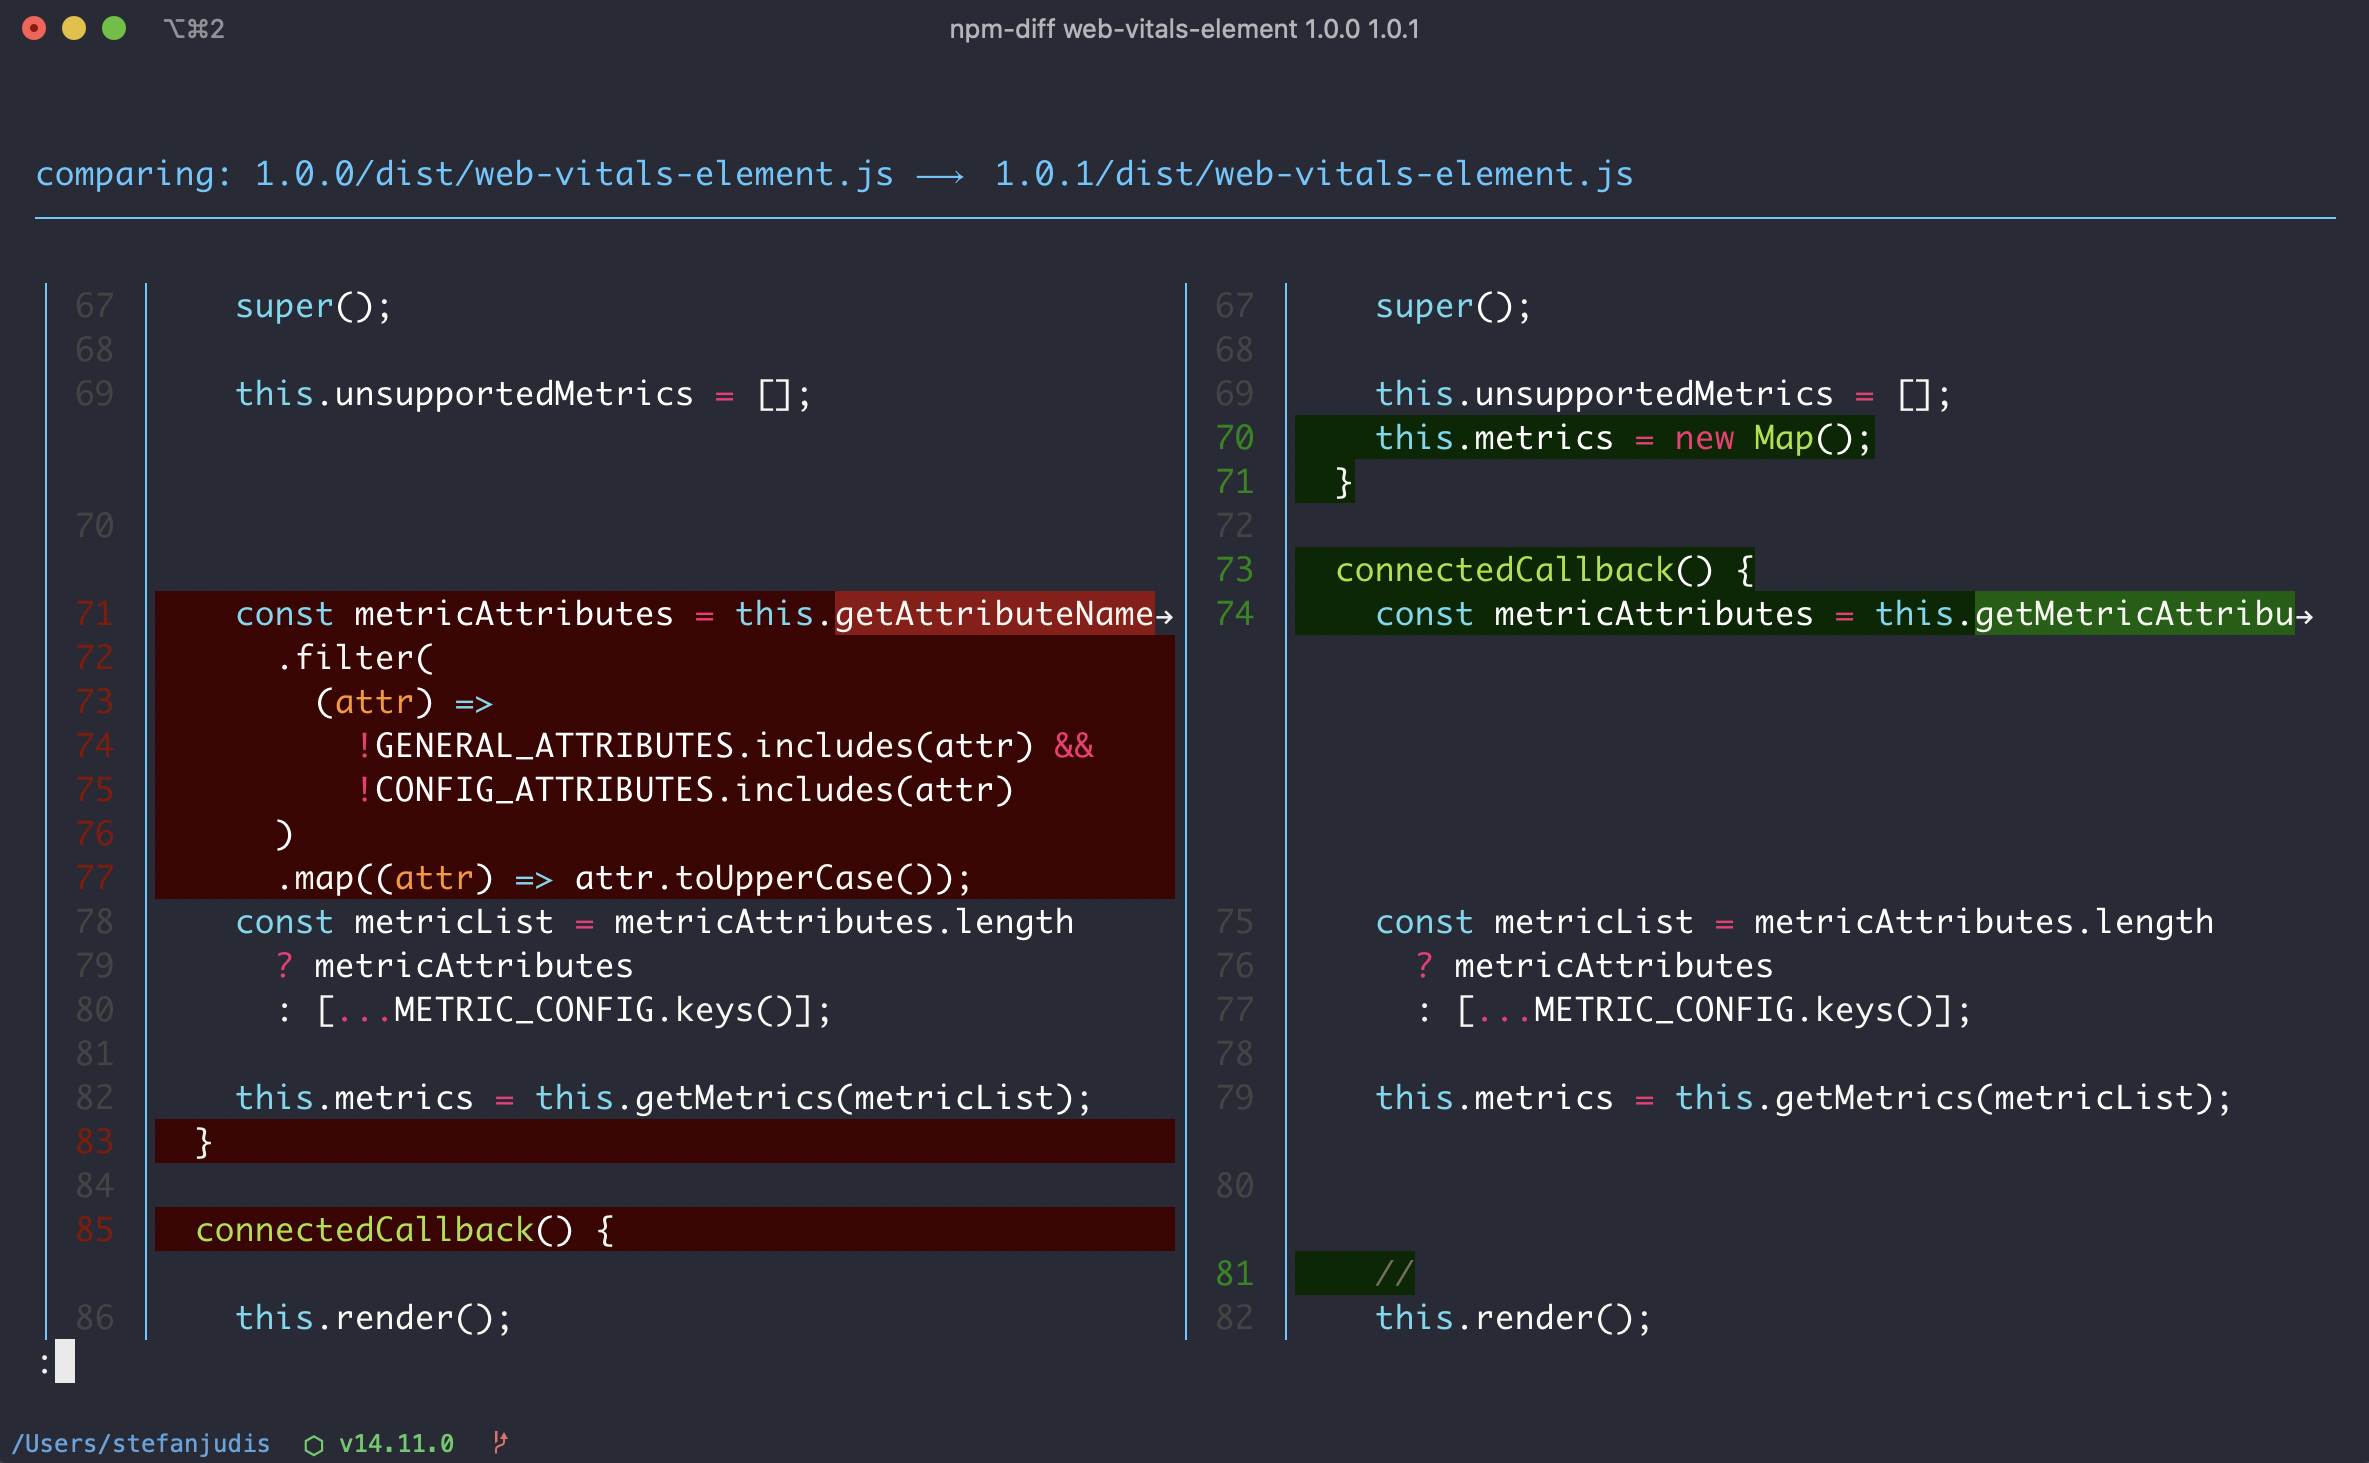 CLI output of npm-diff using delta